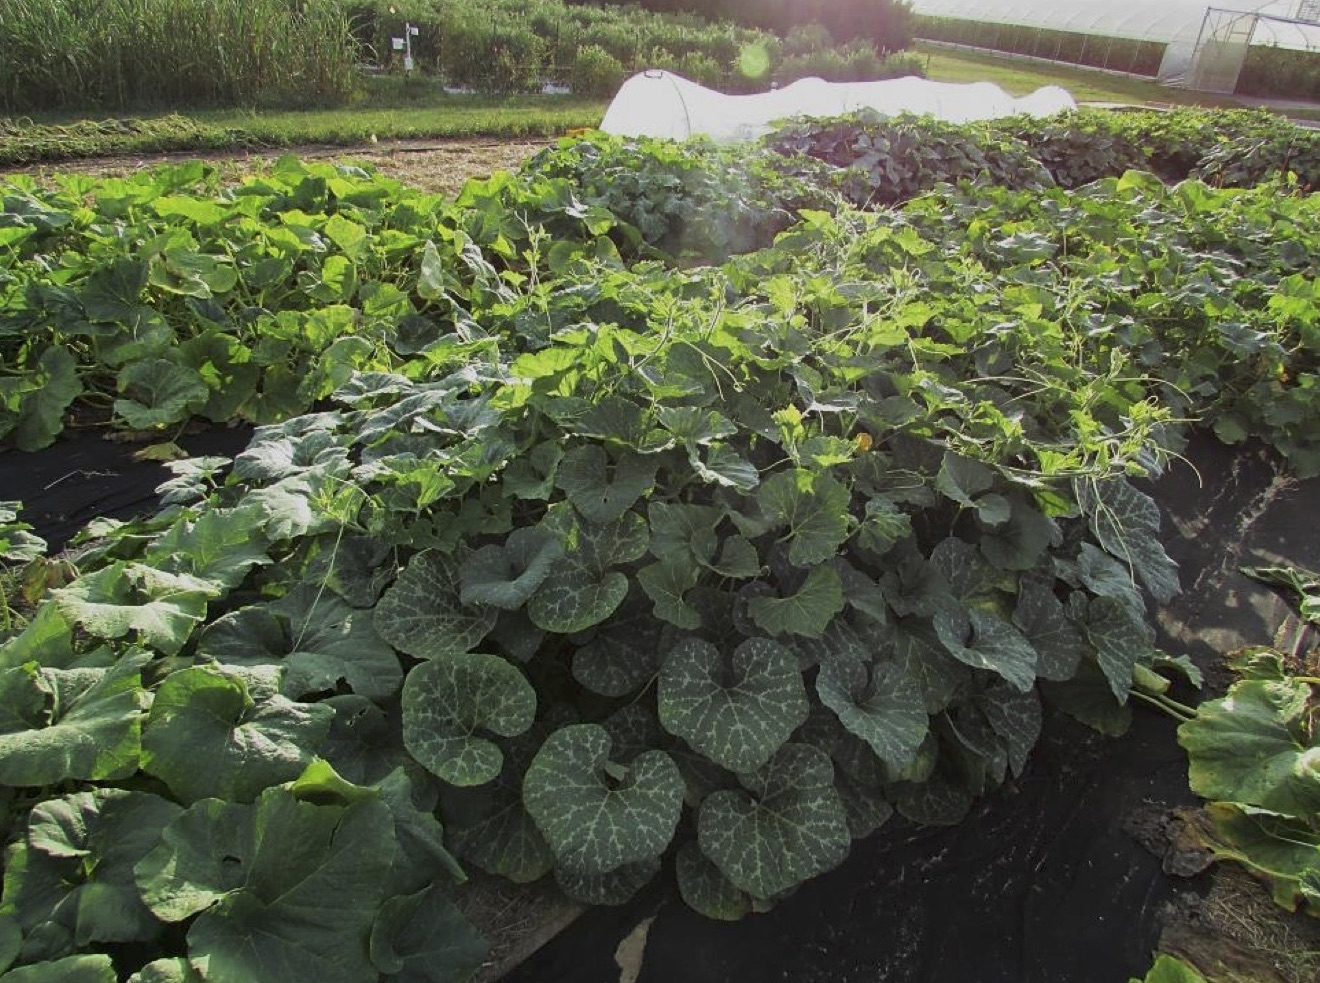 Squash plants grow in plots at the University of Georgia's Durham Horticulture Farm in Watkinsville, Georgia.